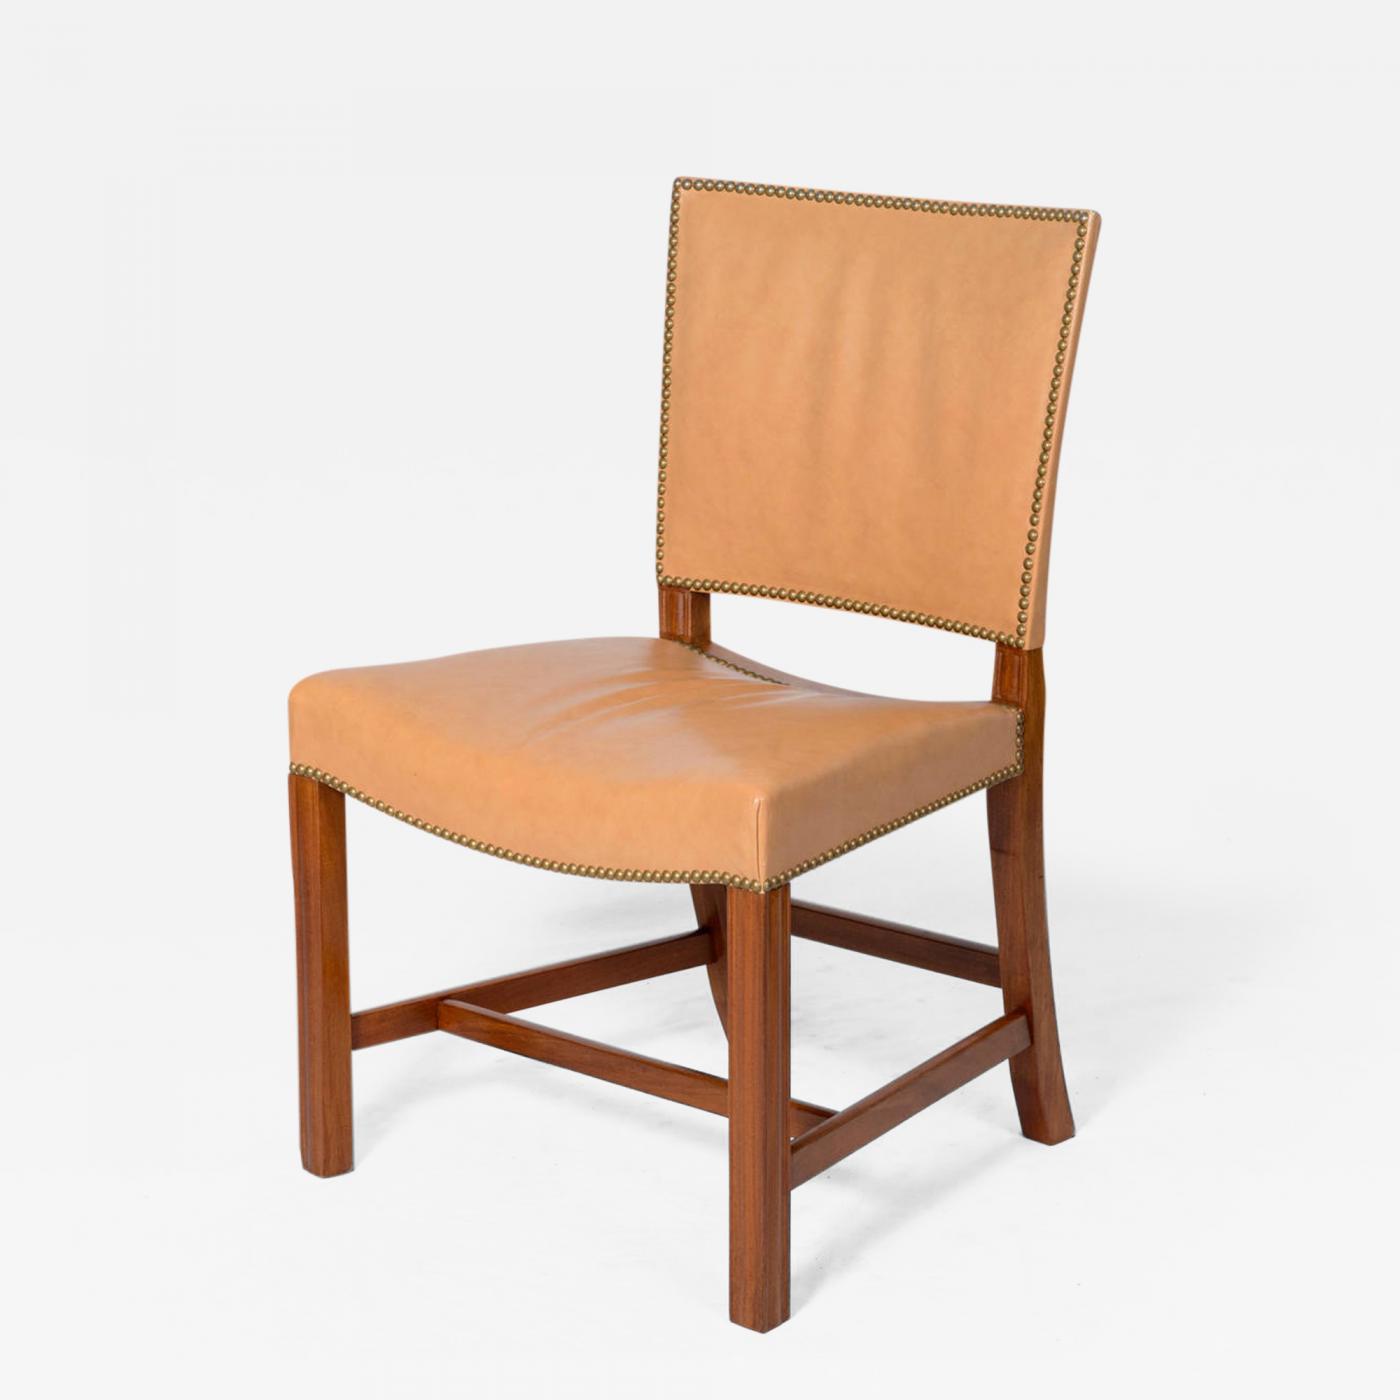 Kaare Klint Kaare Klint Side Chair